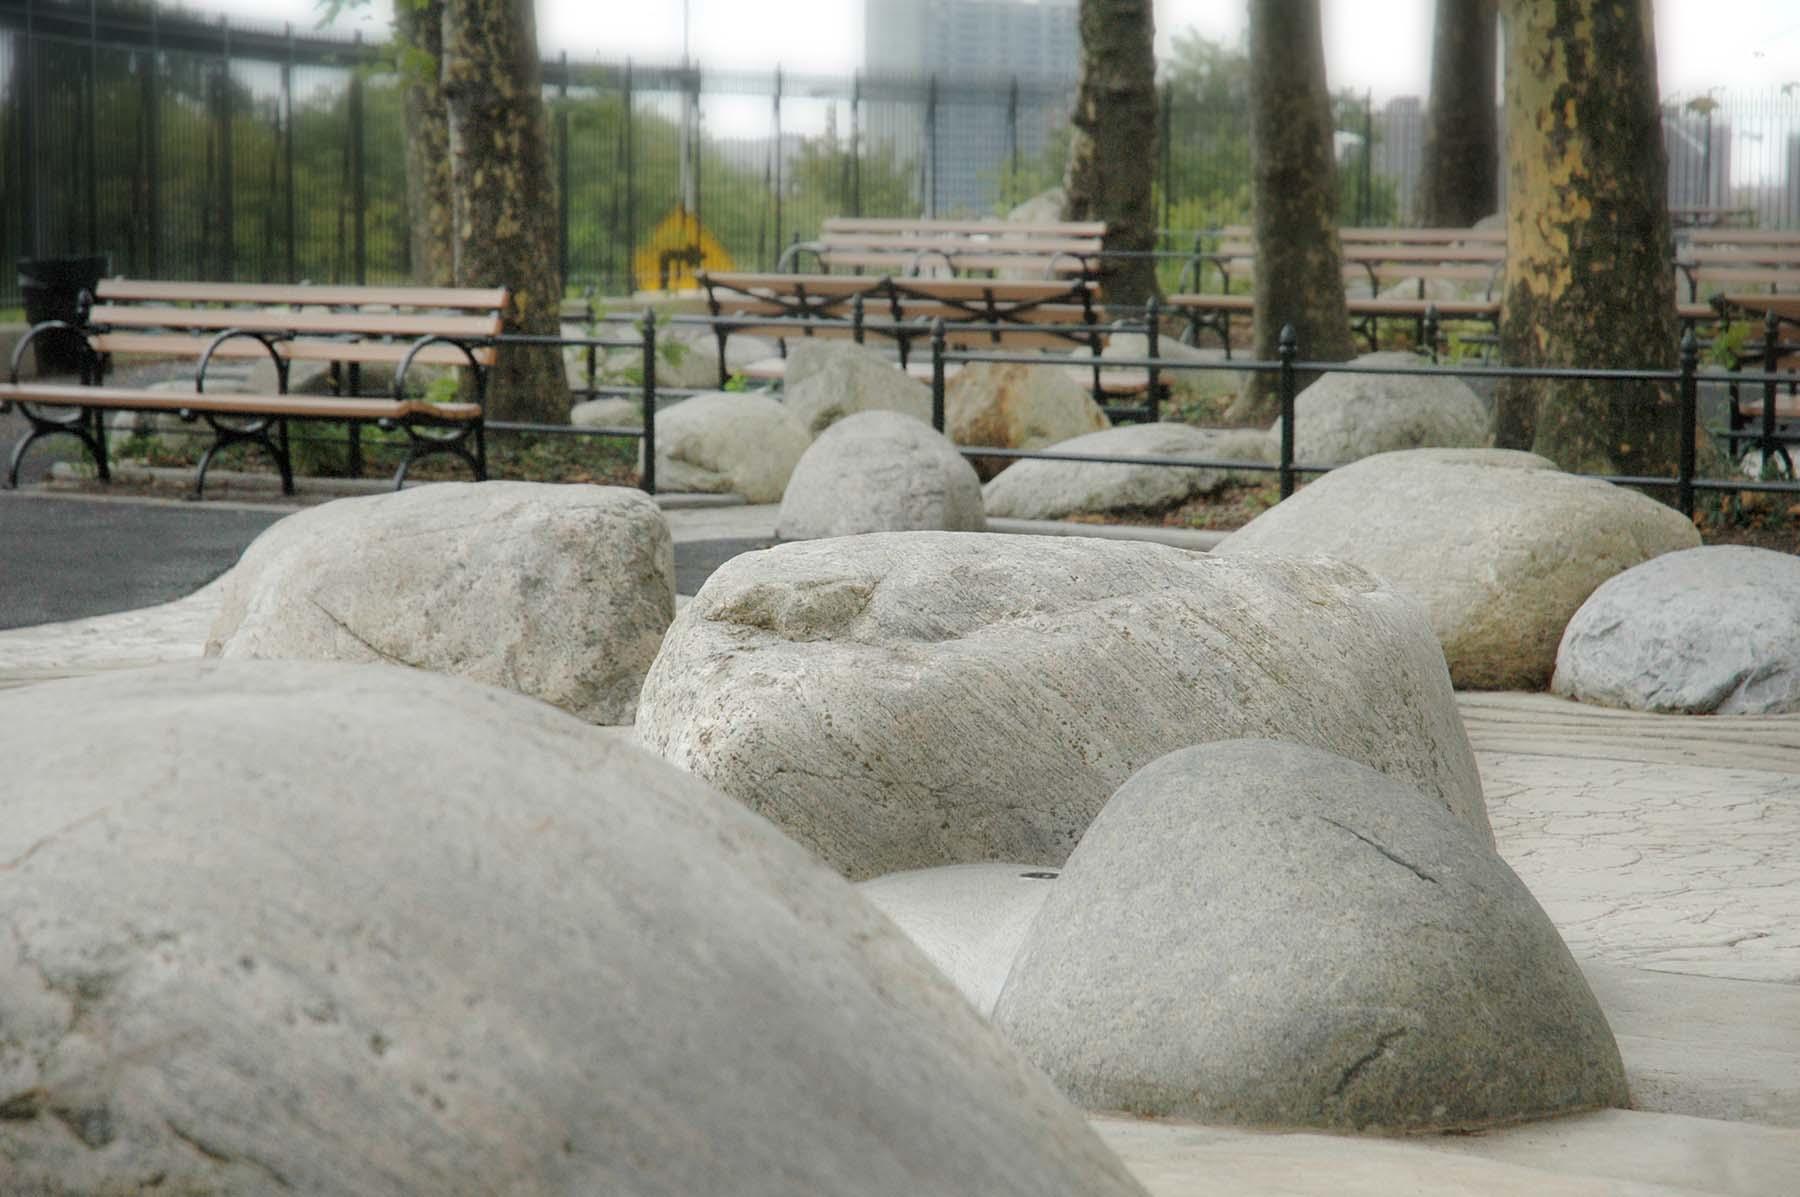 adirondack fieldstone boulders in urban park